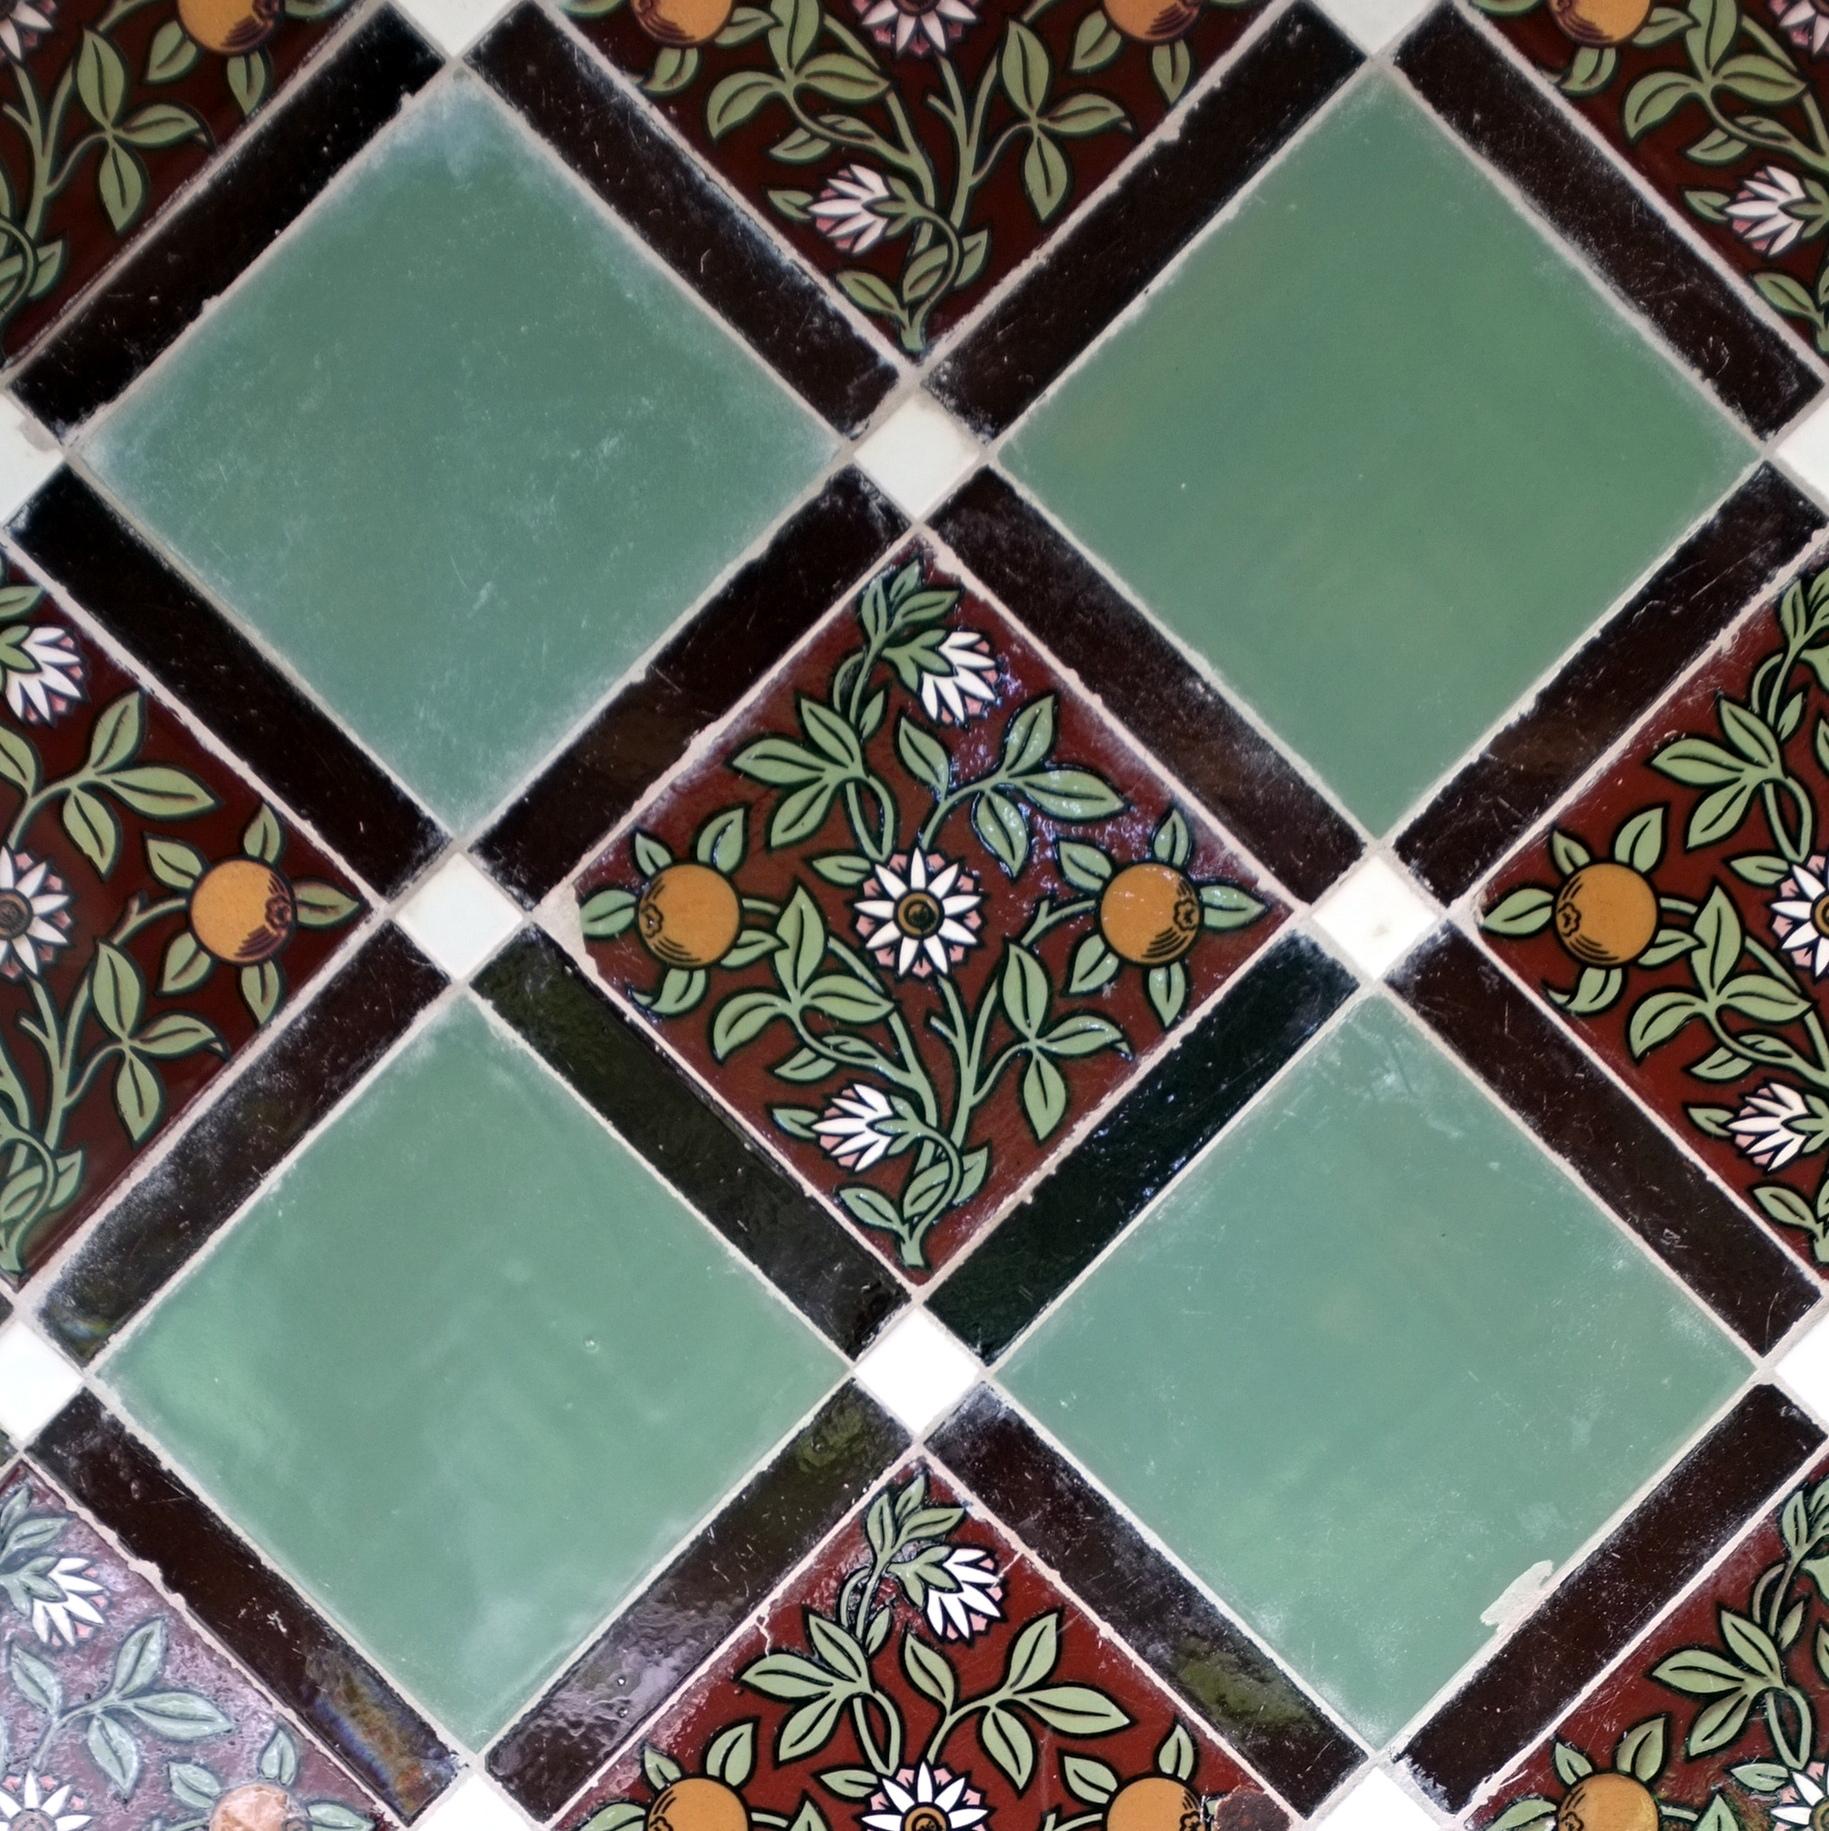 filegarden tiles 7433823224jpg - Garden Tiles